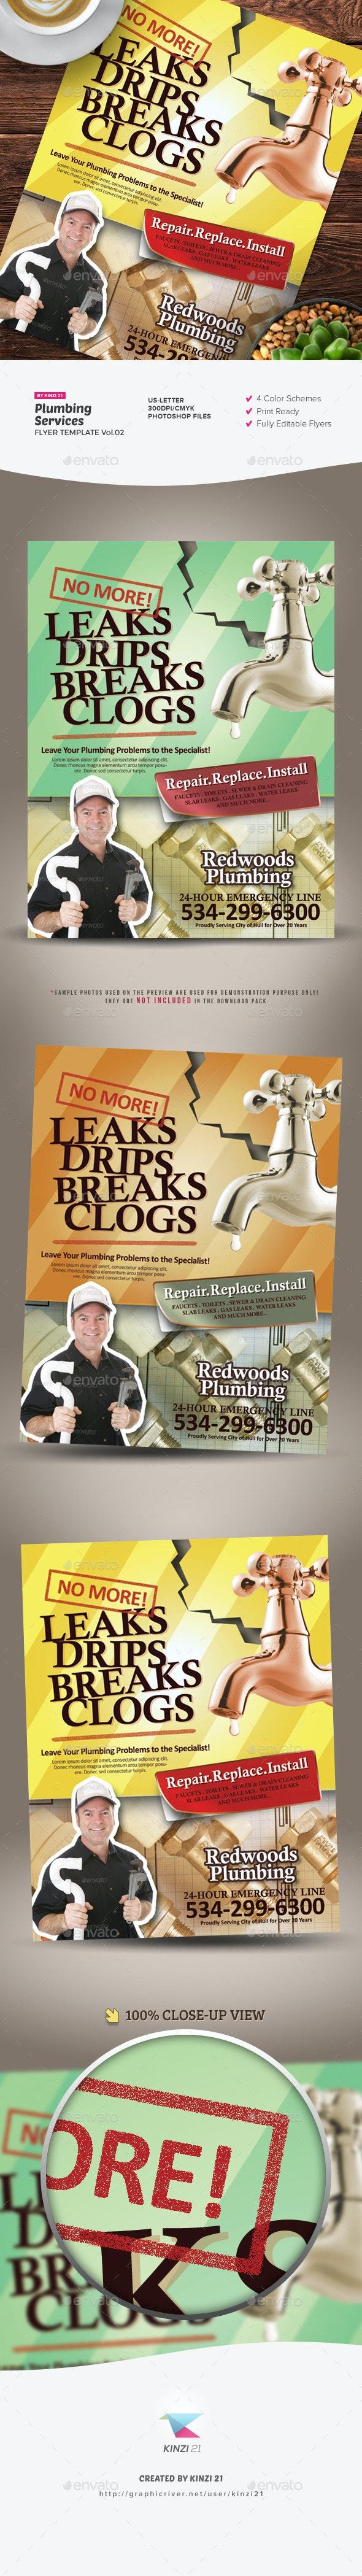 Plumbing Services Flyer Vol.02 - Corporate Flyers